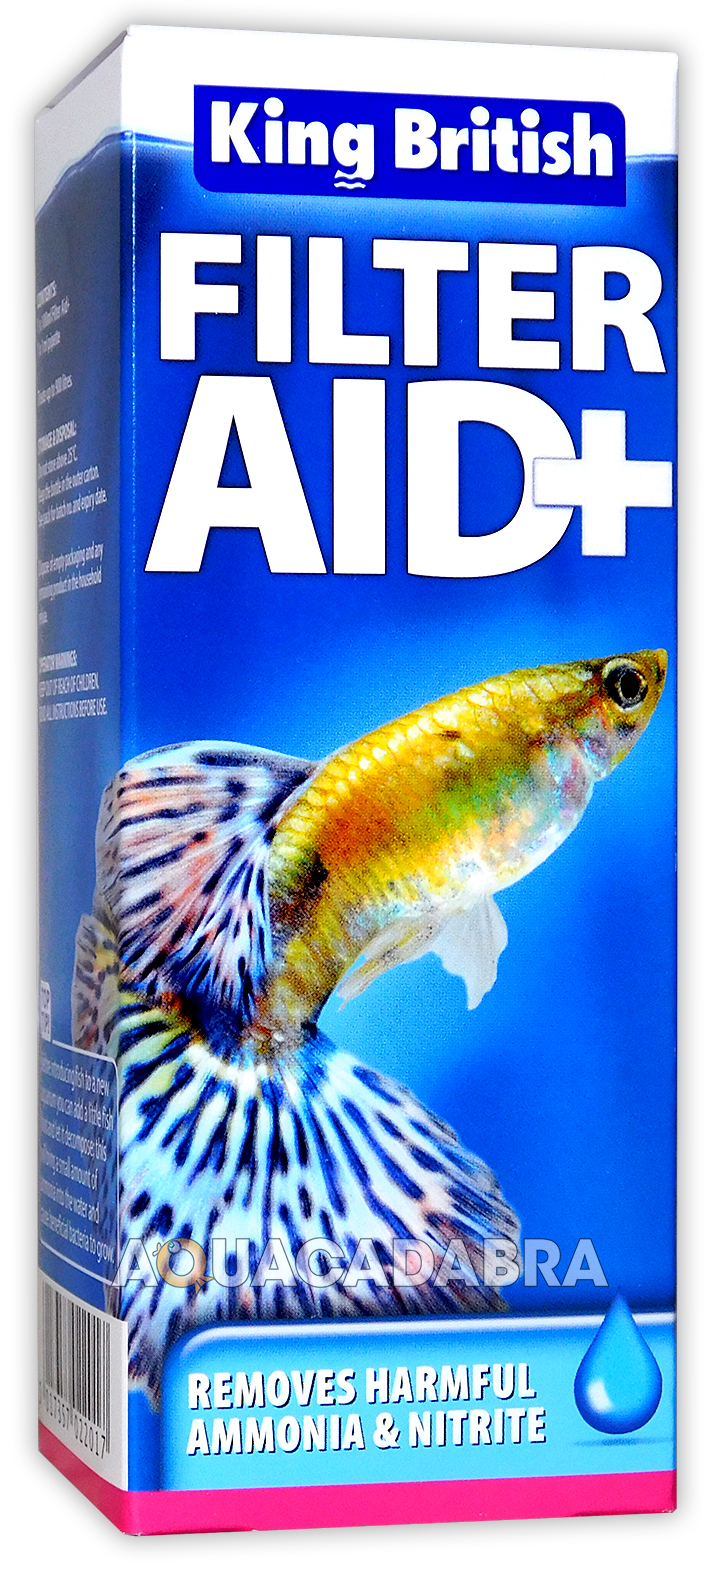 KING-BRITISH-FILTER-AID-SAFE-WATER-FISH-TANK-AQUARIUM-NITRITE-AMMONIA-TREATMENT